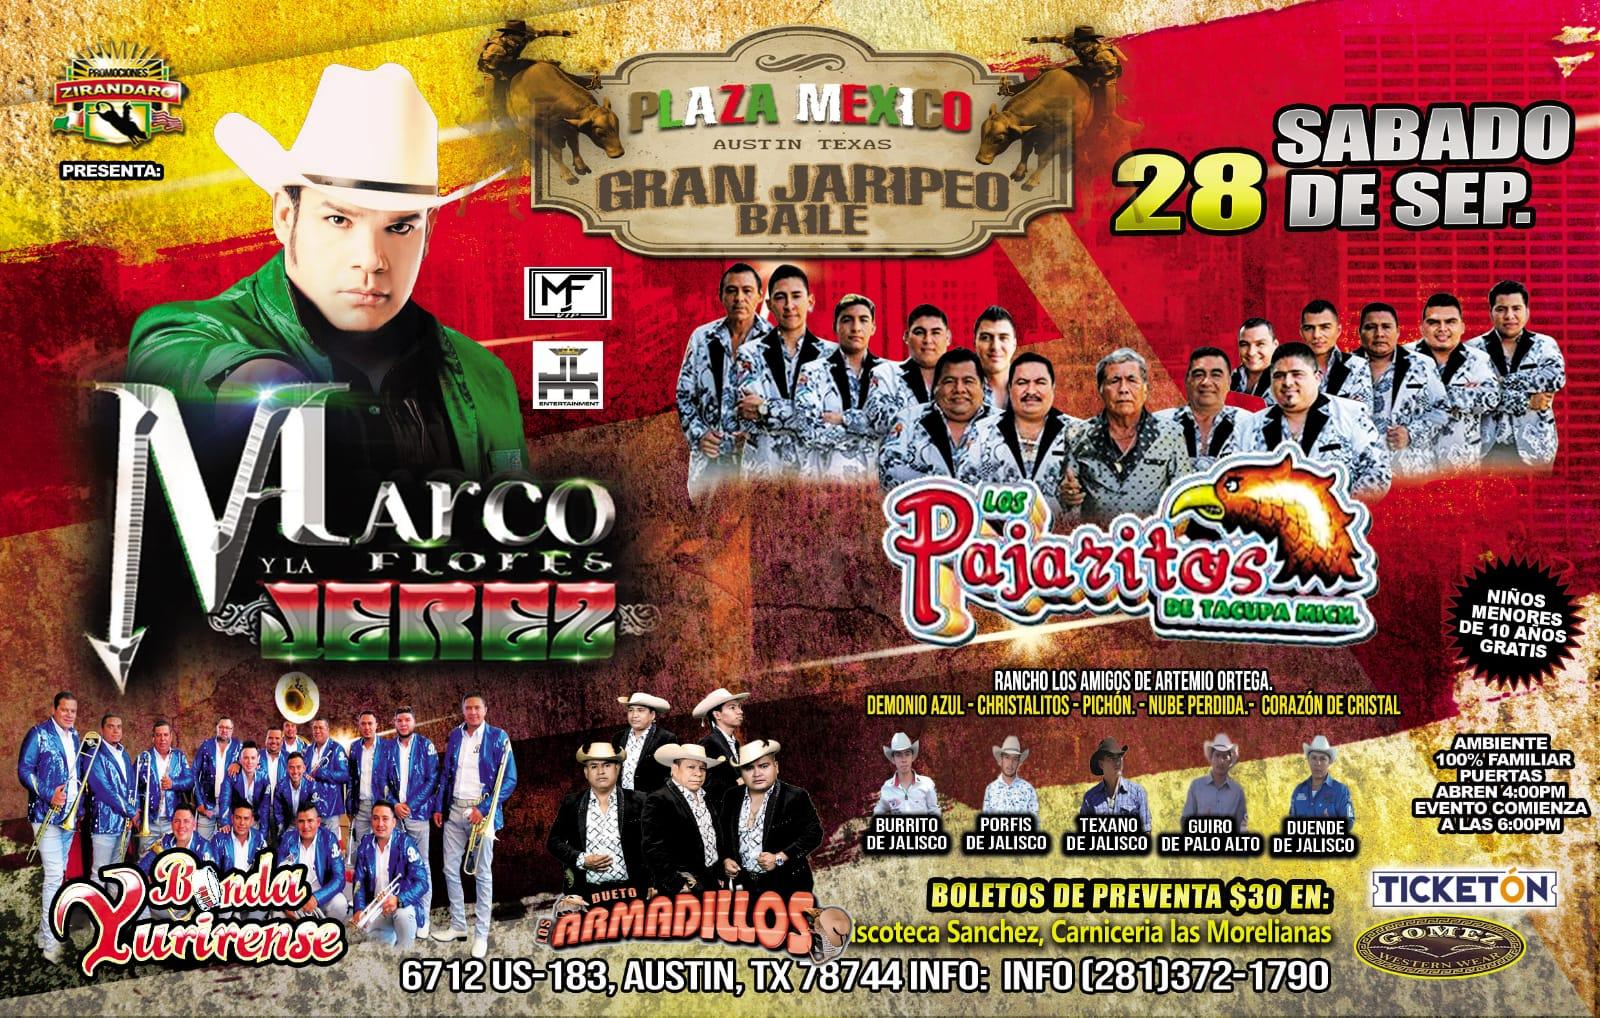 1 BANDA JEREZ Y PAJARITOS Tickets - The PLAZA MEXICO AUSTIN